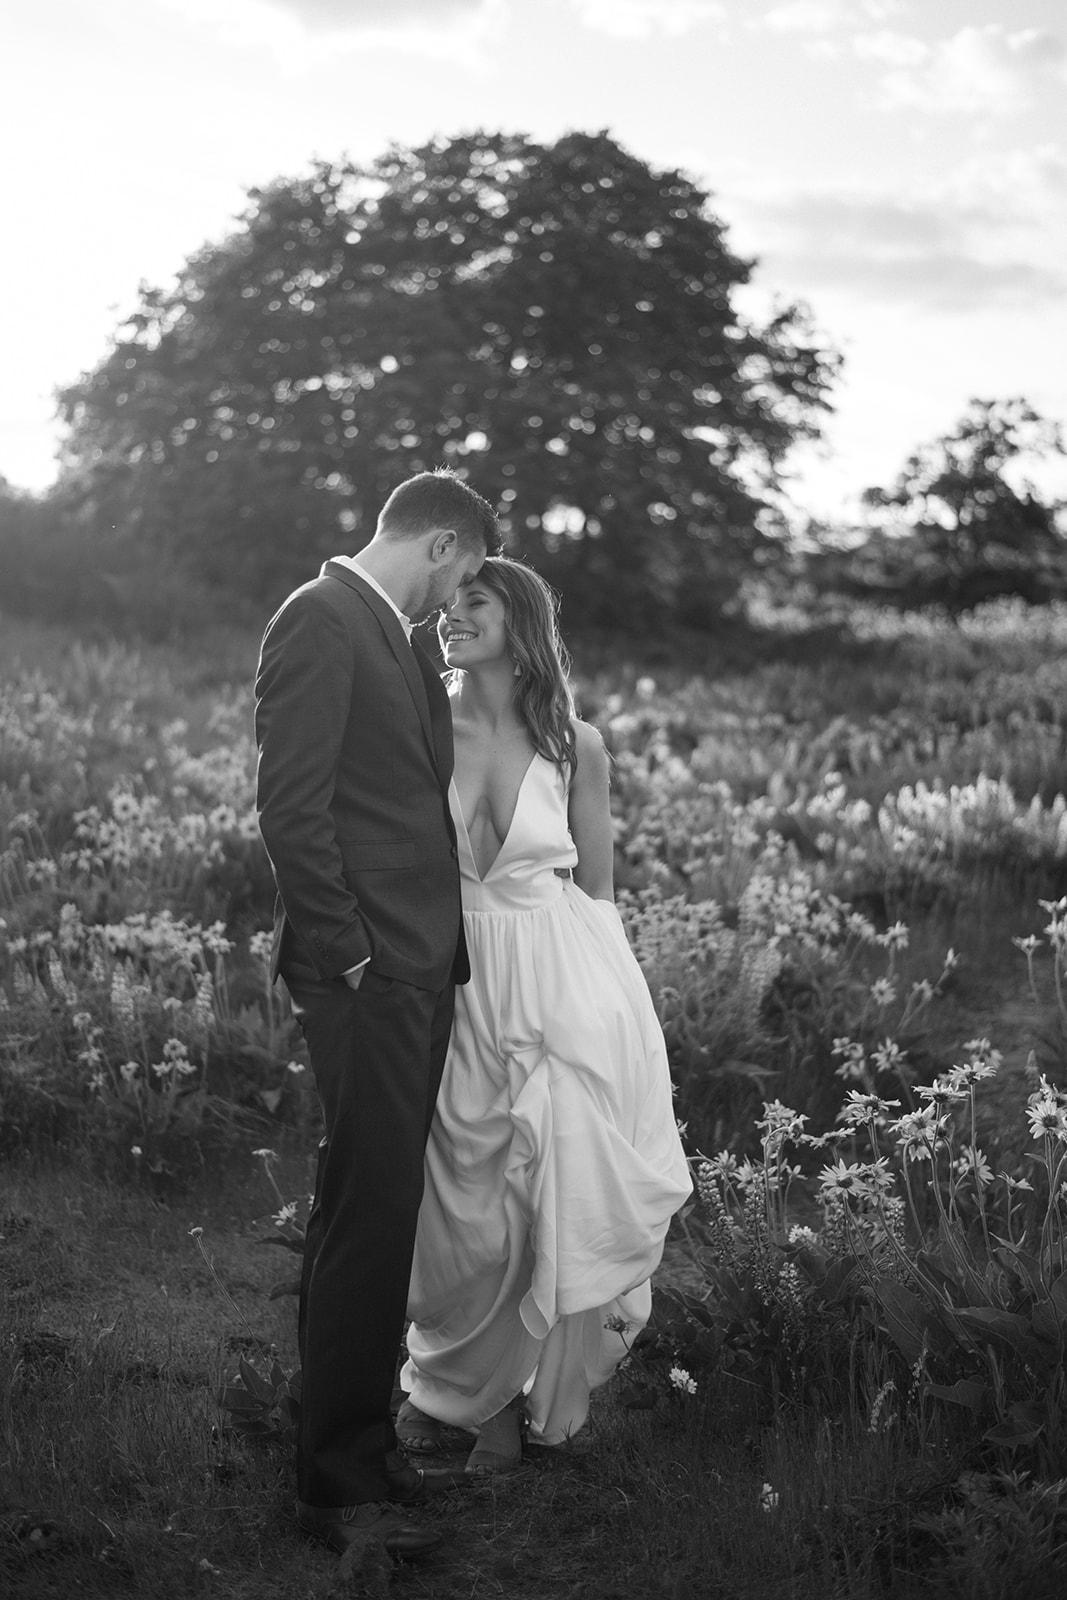 kamea_events_wedding_planner_portland_deus_amor_9926.jpg